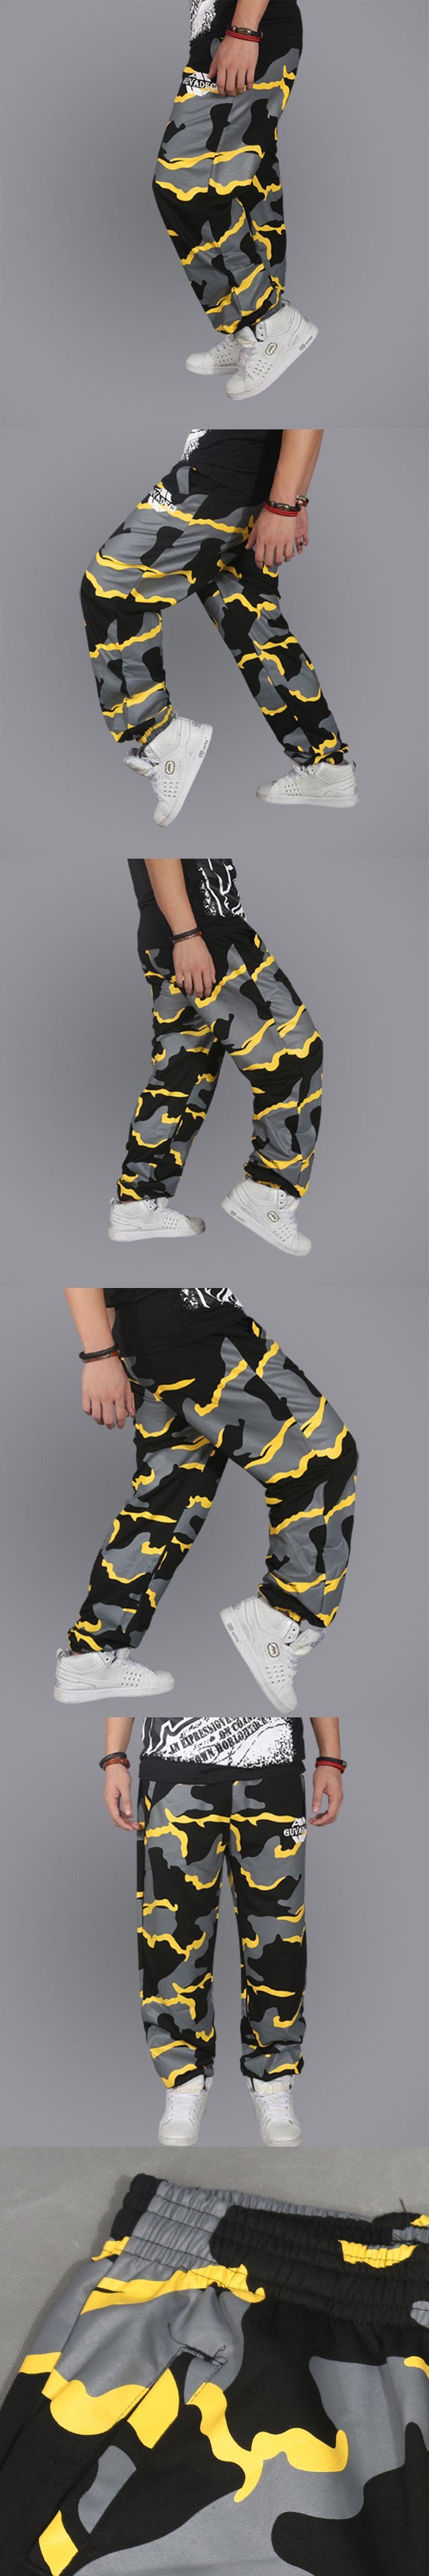 Mens New Loose Hip Hop Joggers Dance Pants Parkour Skateboard Sweatpants Long Pants Boys Pants Mens Full Length Slacks Trousers